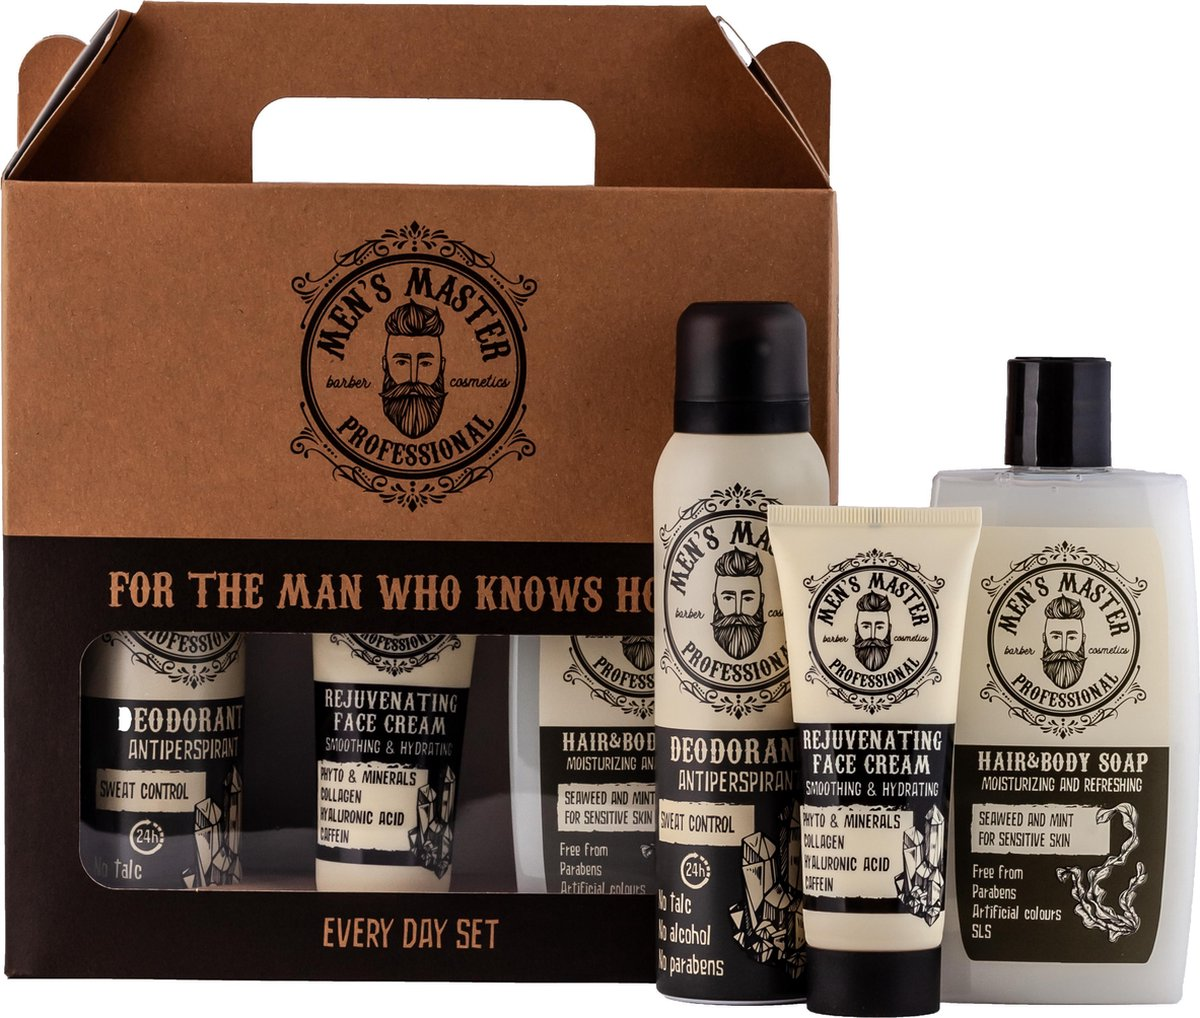 Men's Master Professional Every Day Set - Deodorant & Gezichtscr me & Hair & Body Soap   Geschenk  v